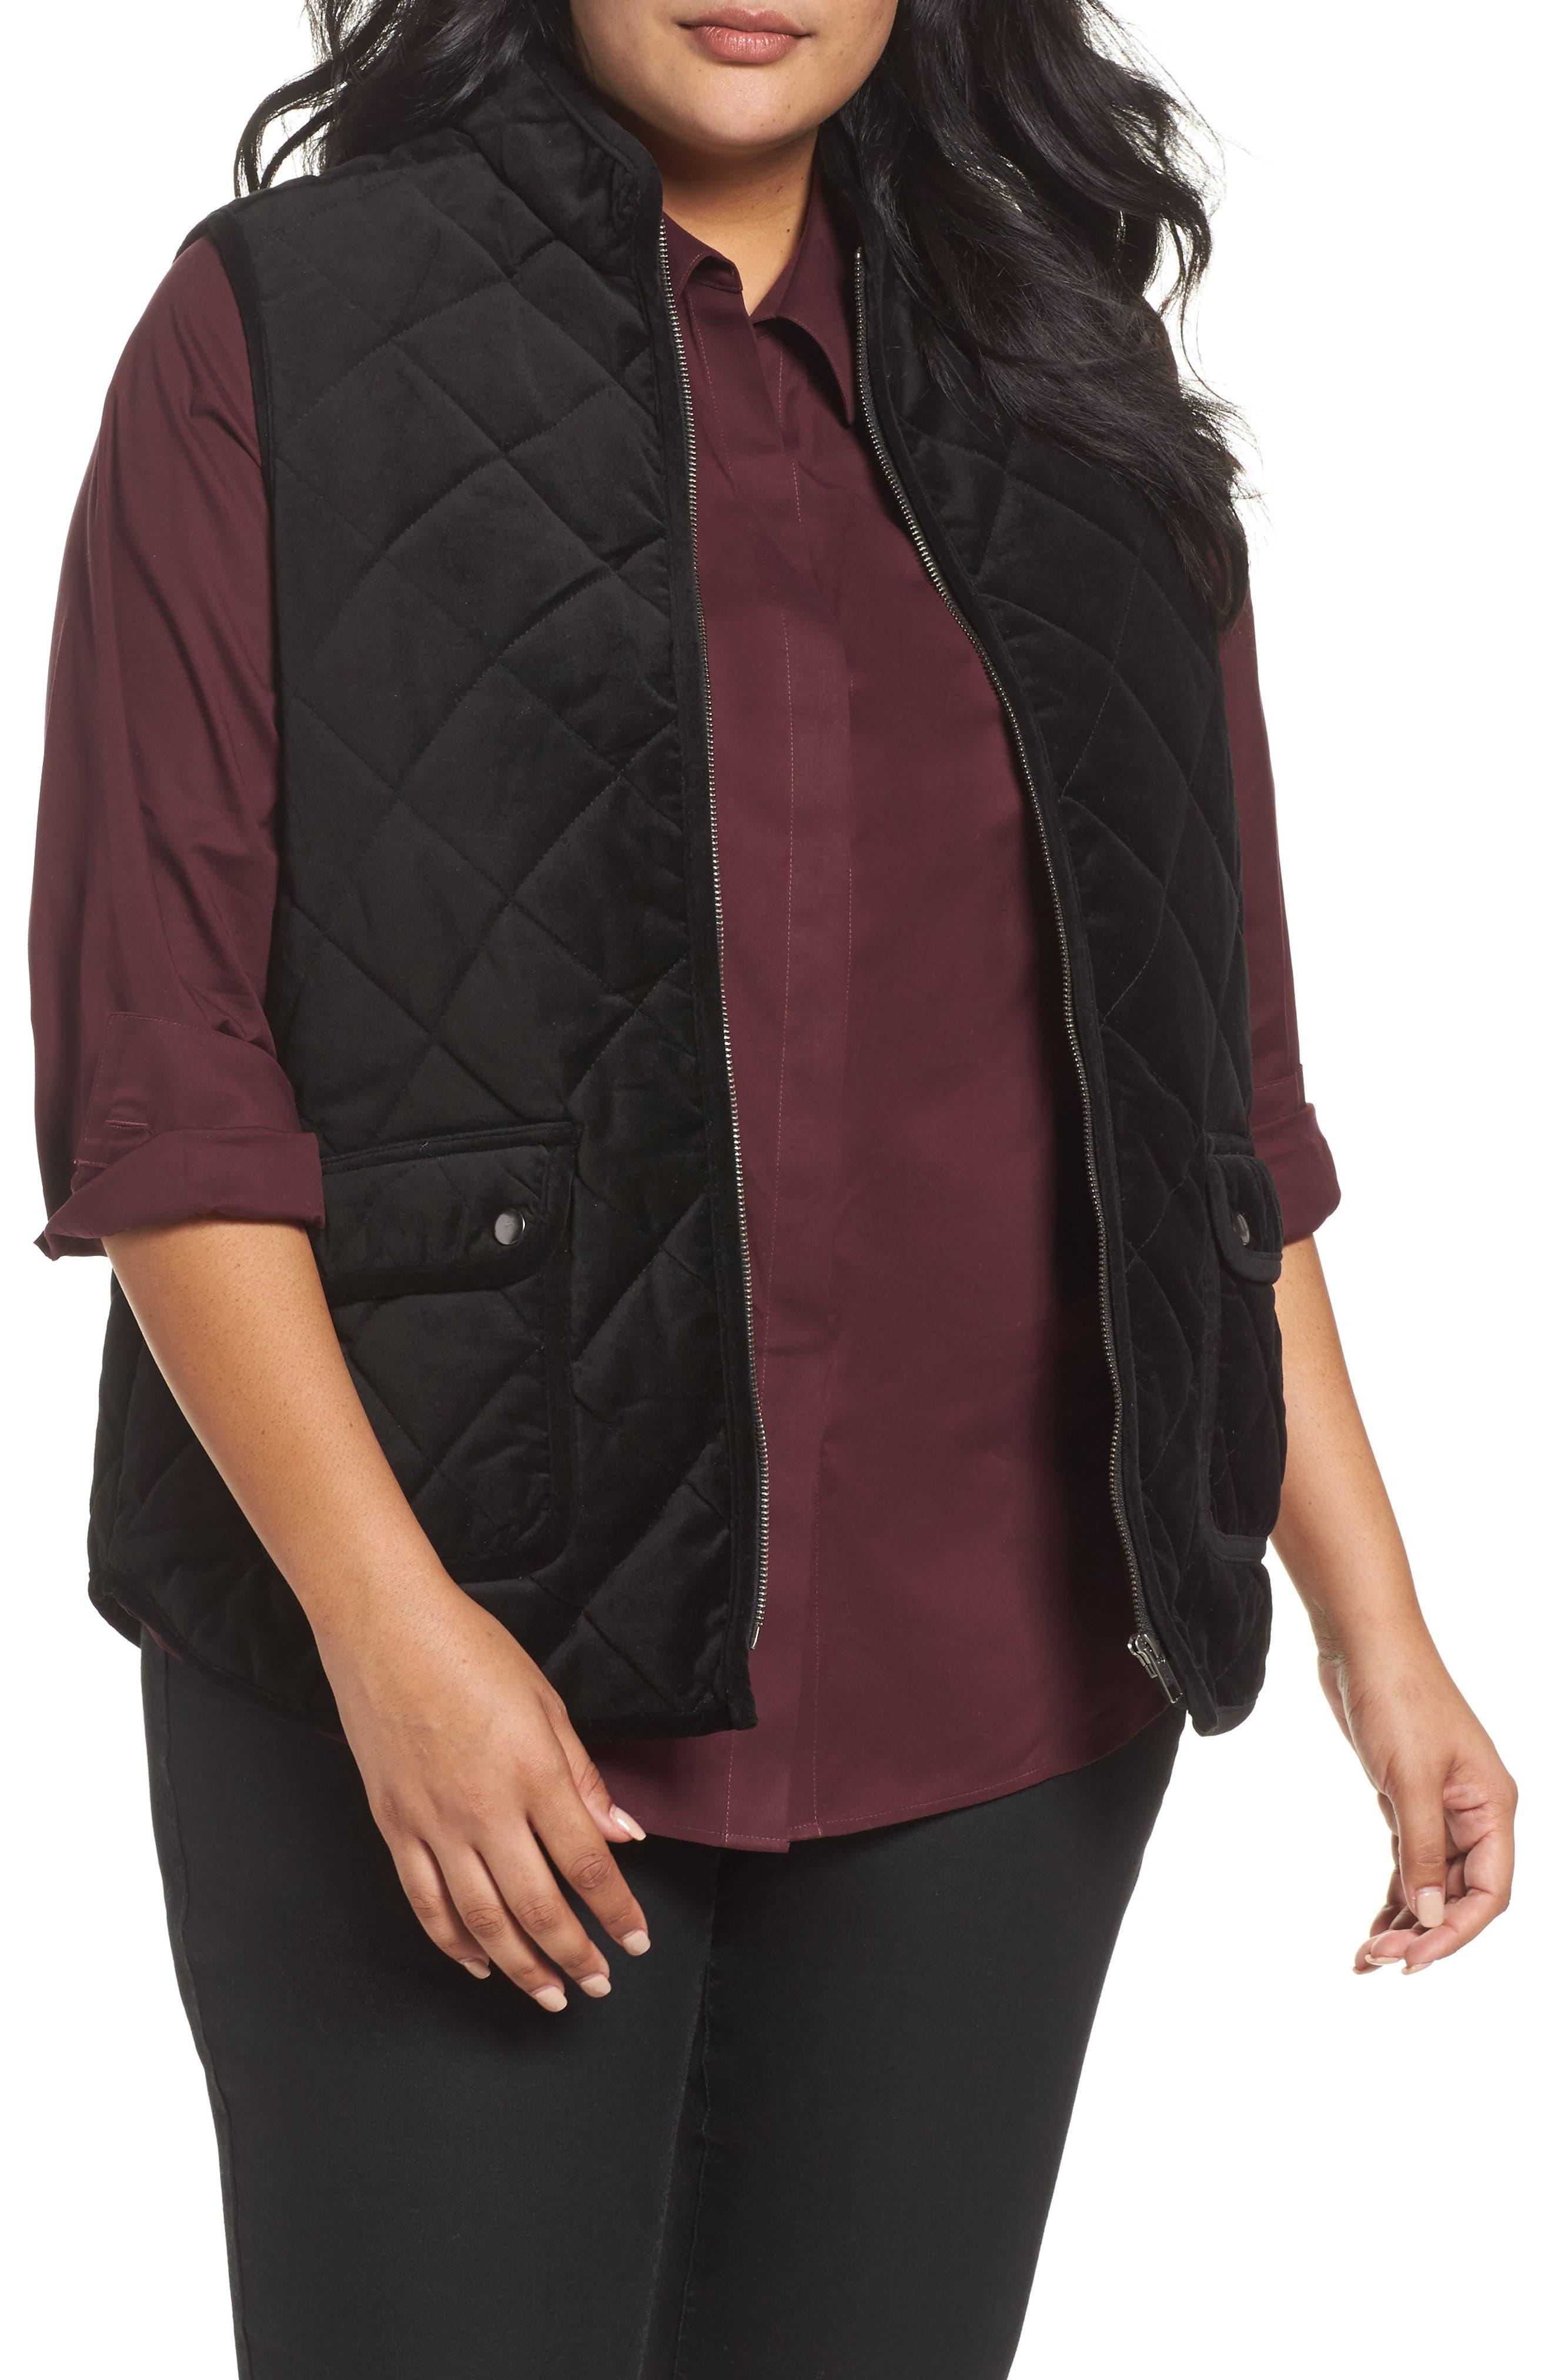 Lena Quilted Velvet Vest,                             Main thumbnail 1, color,                             Black